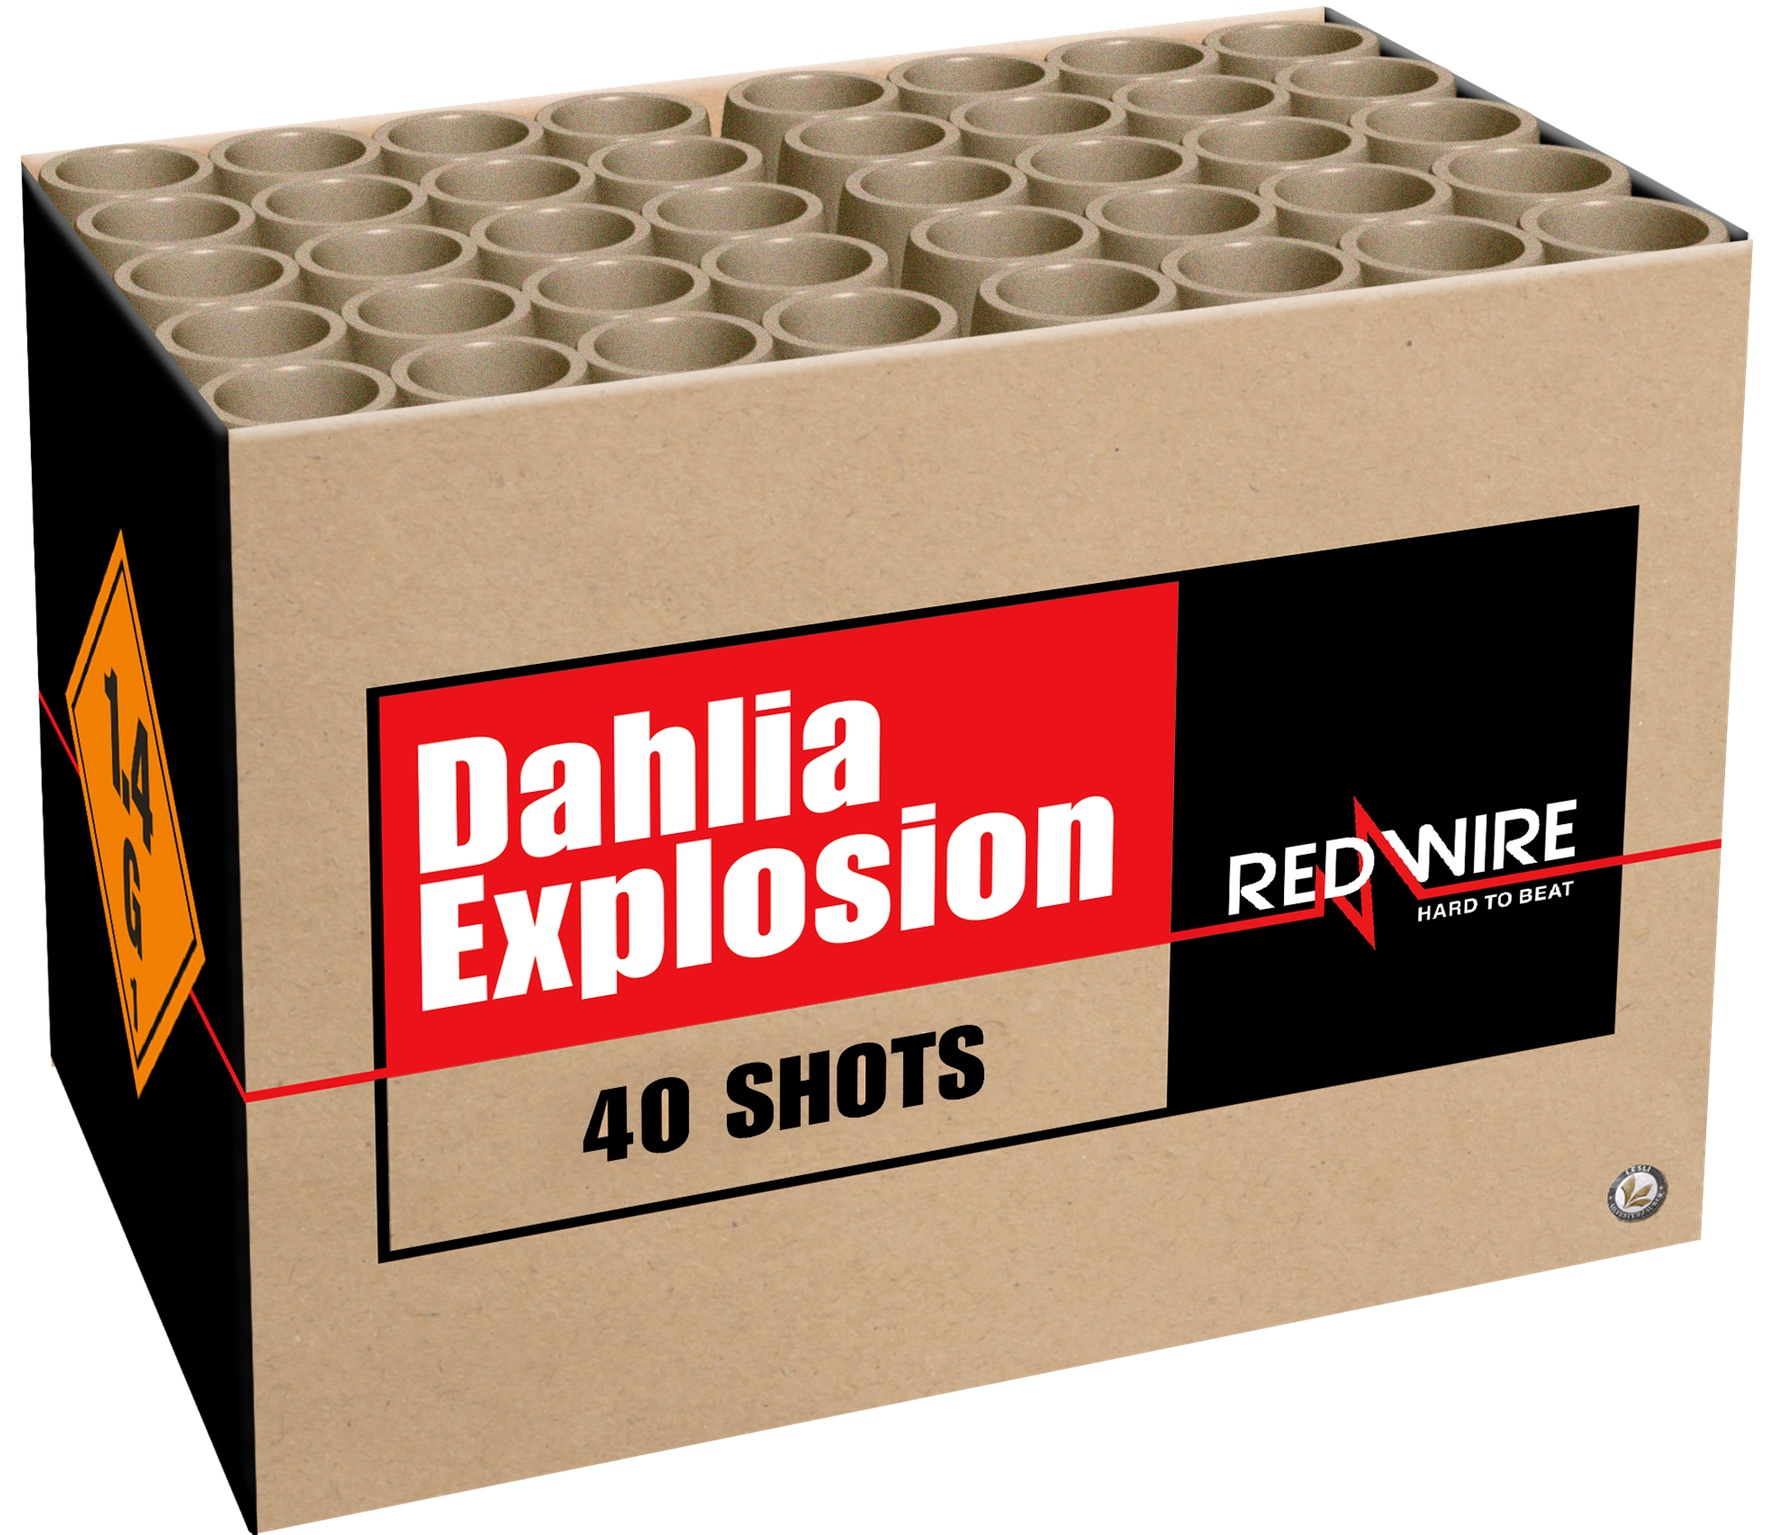 Dahlia Exlosion